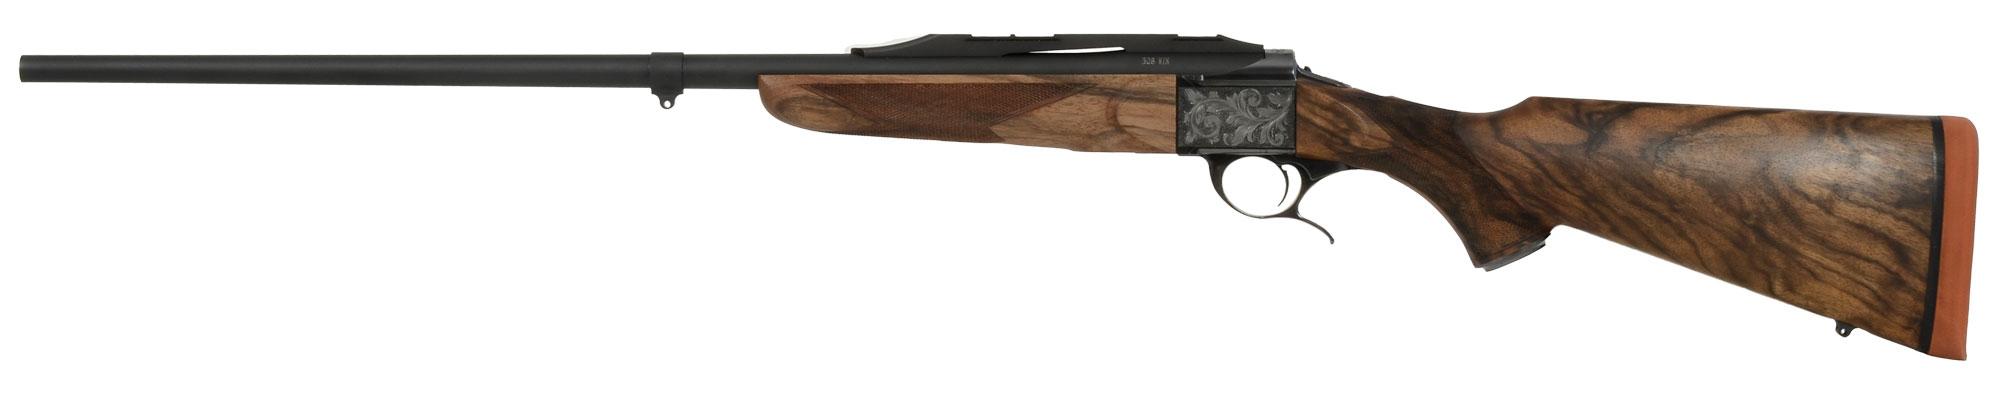 Luxus Arms Model 11 Single Shot 308 Win L298